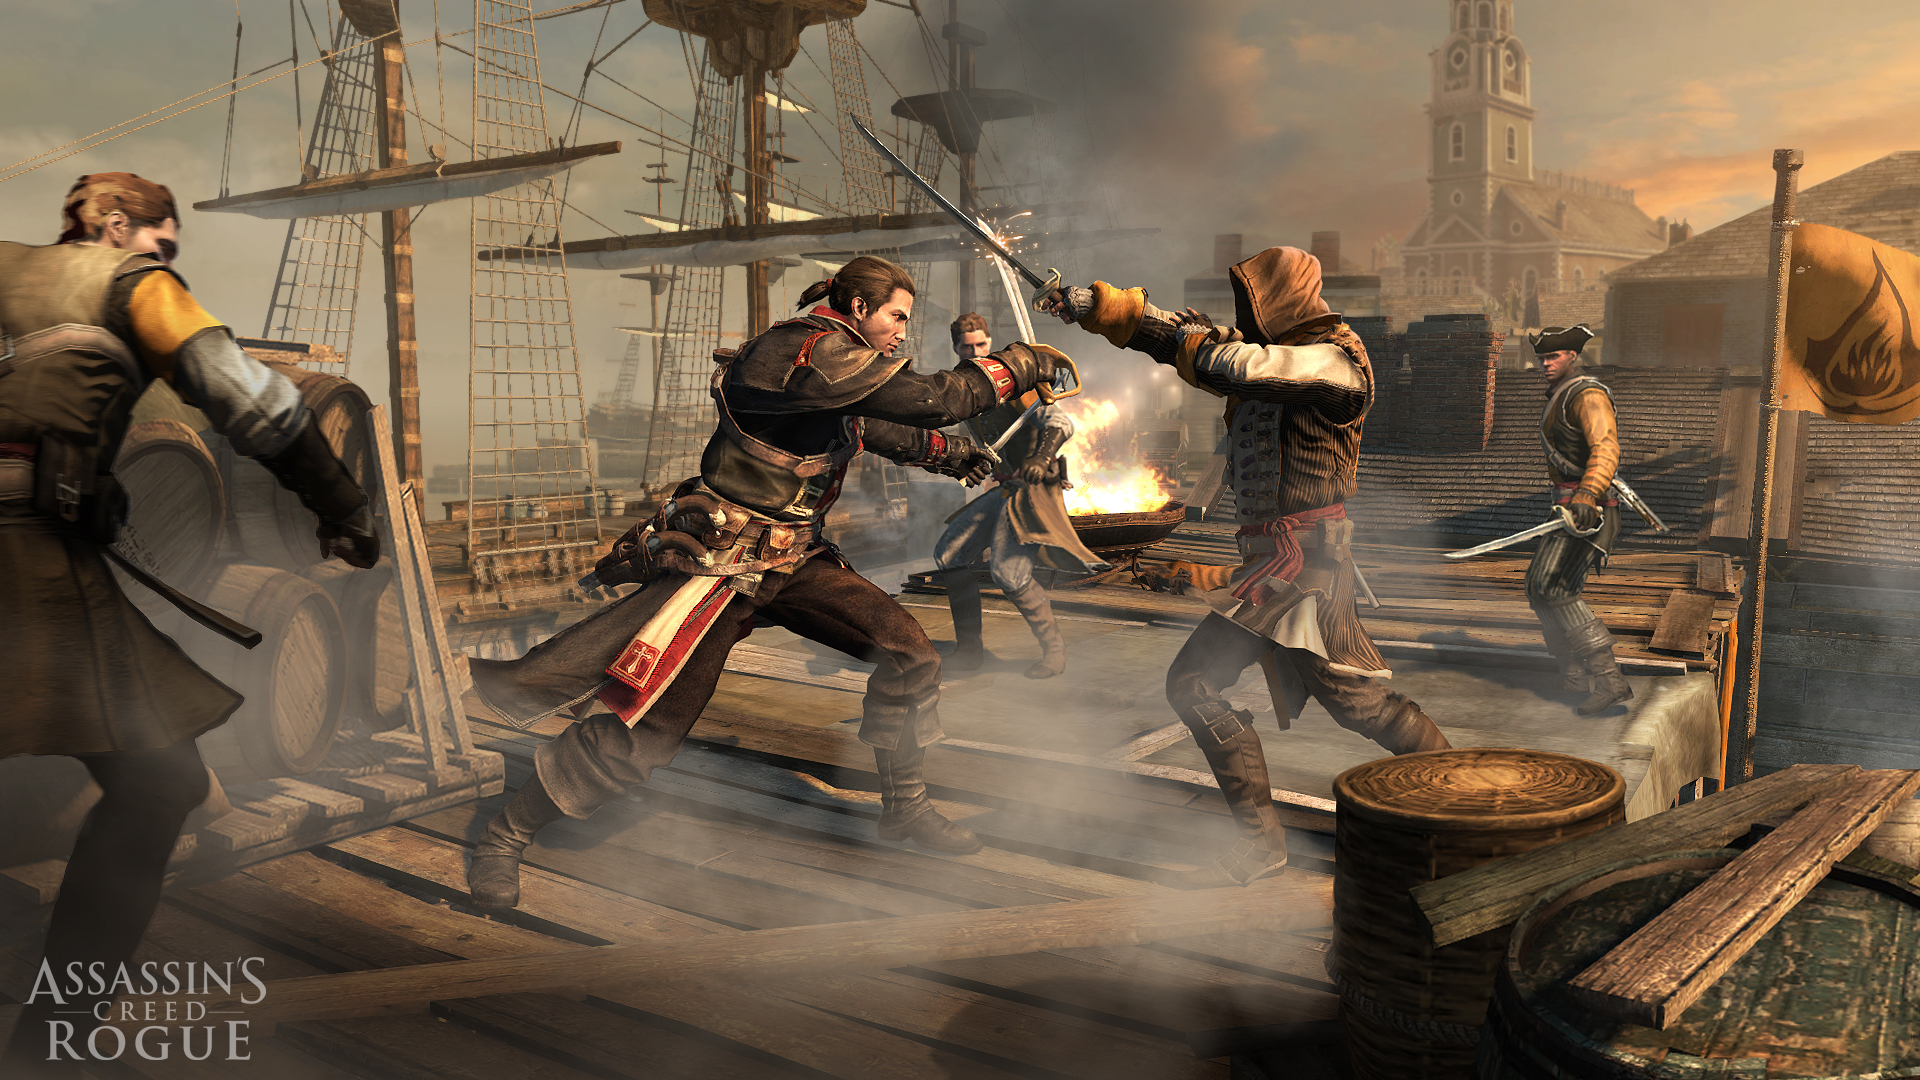 Assassin's Creed Rogue 05-08-14 003